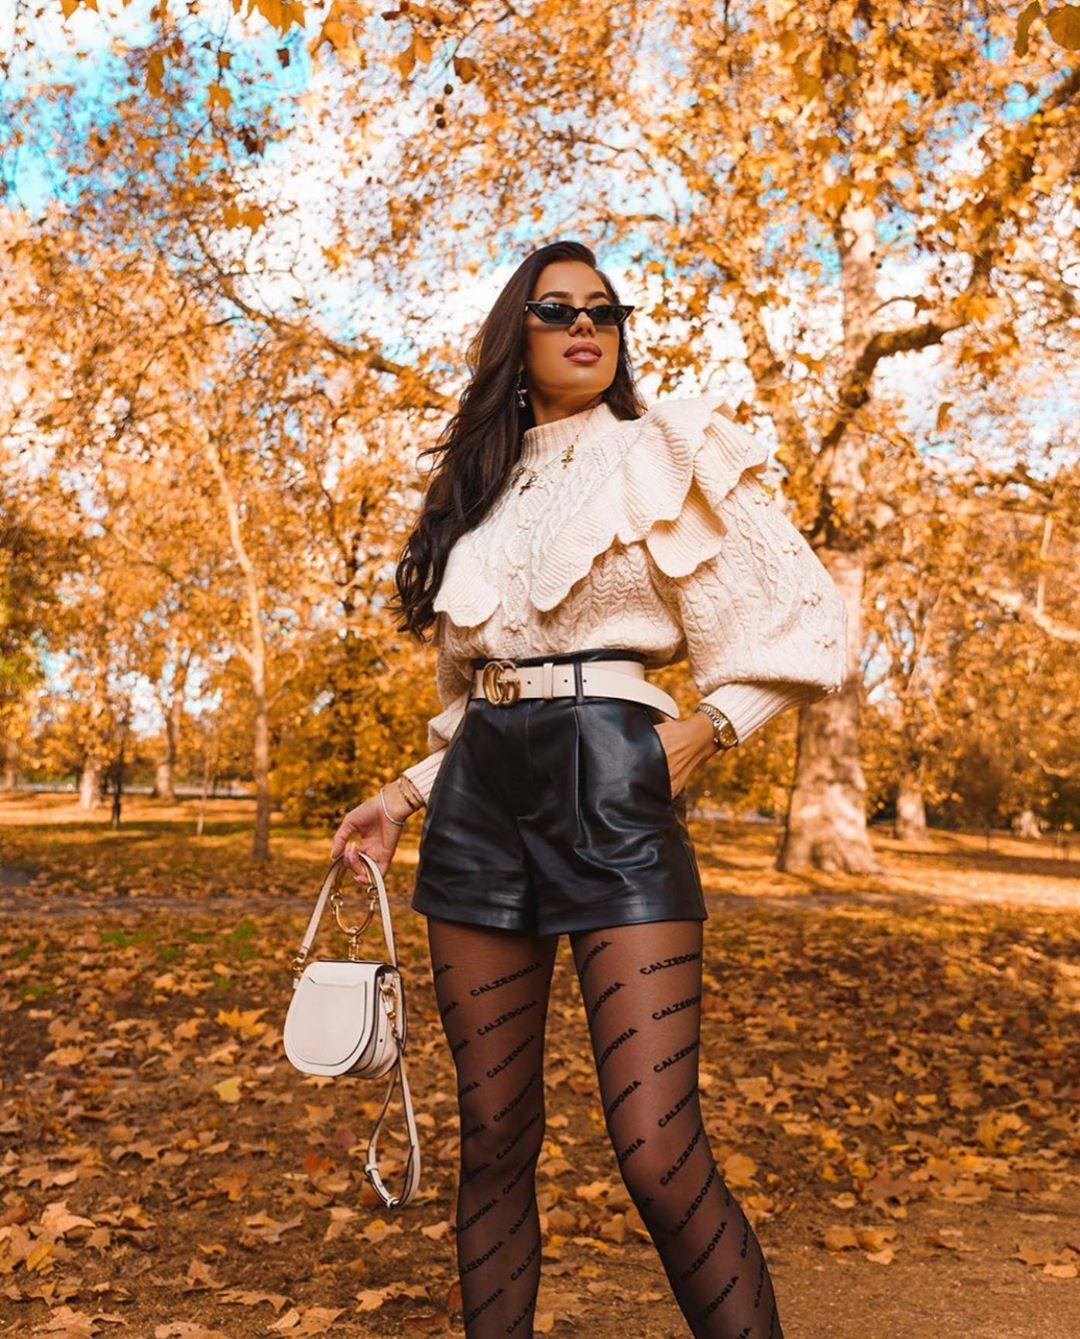 sweater with twists and ruffles de Zara sur zarastreetstyle